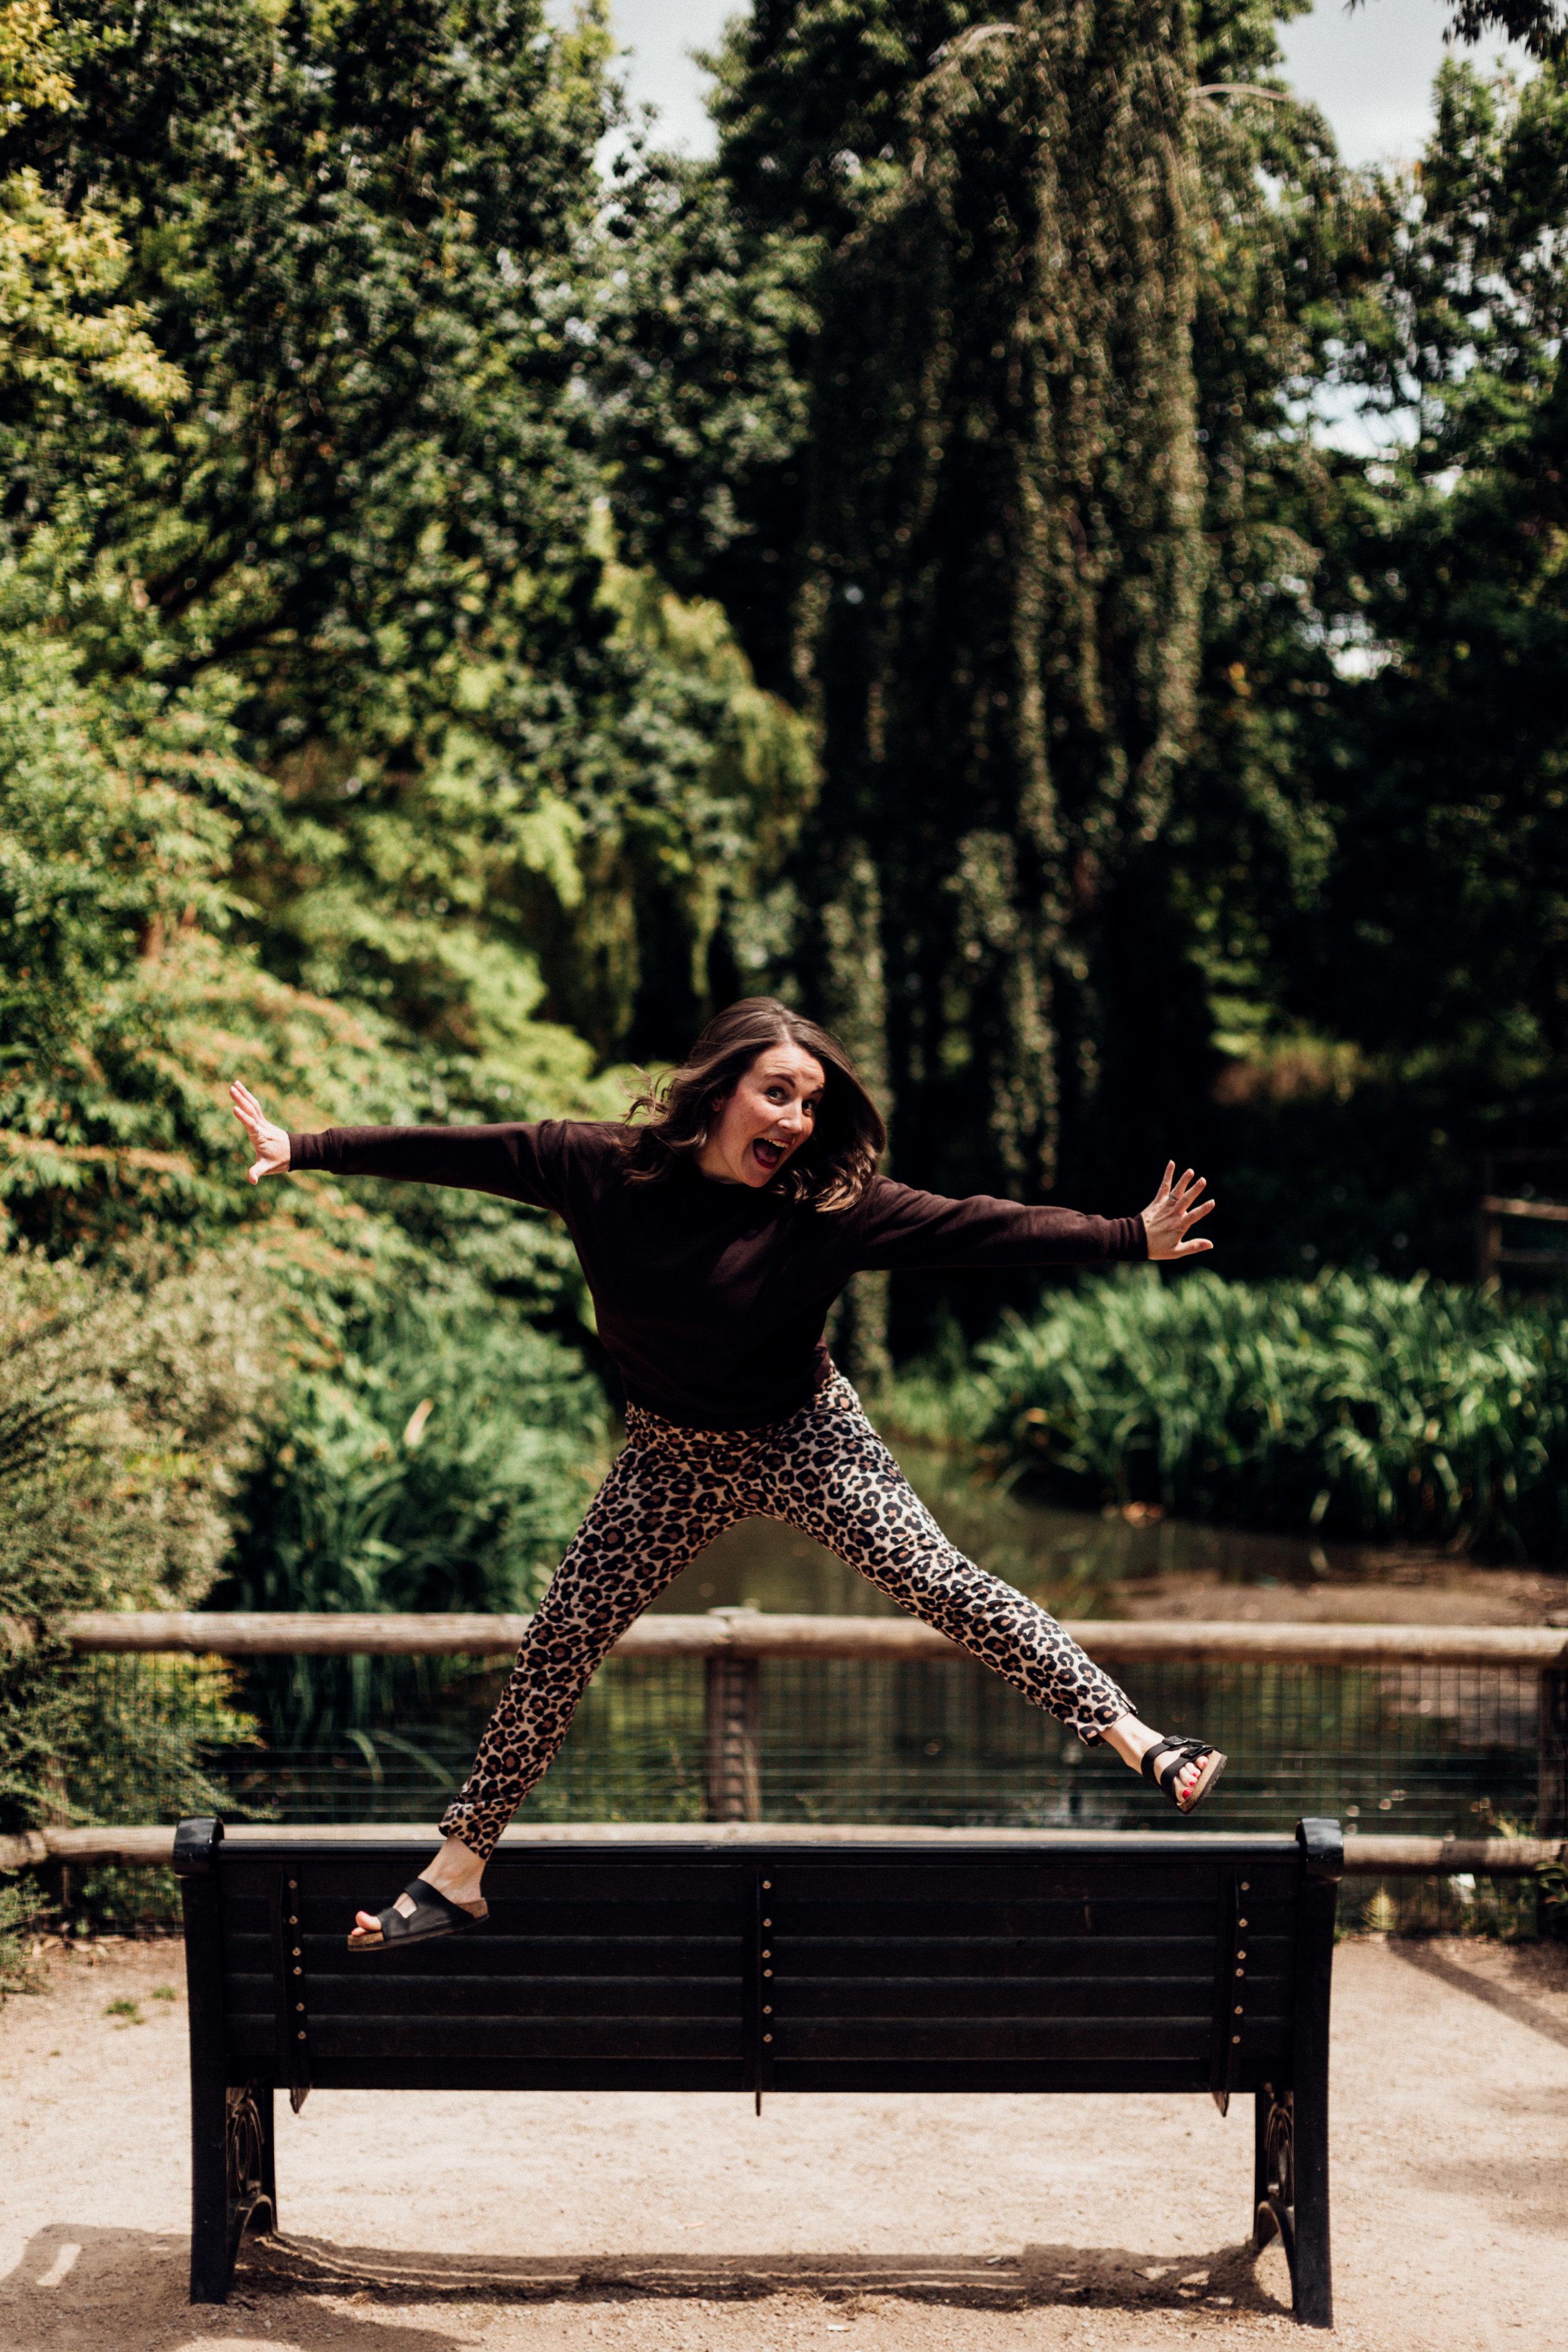 Kerry Lyons star jump